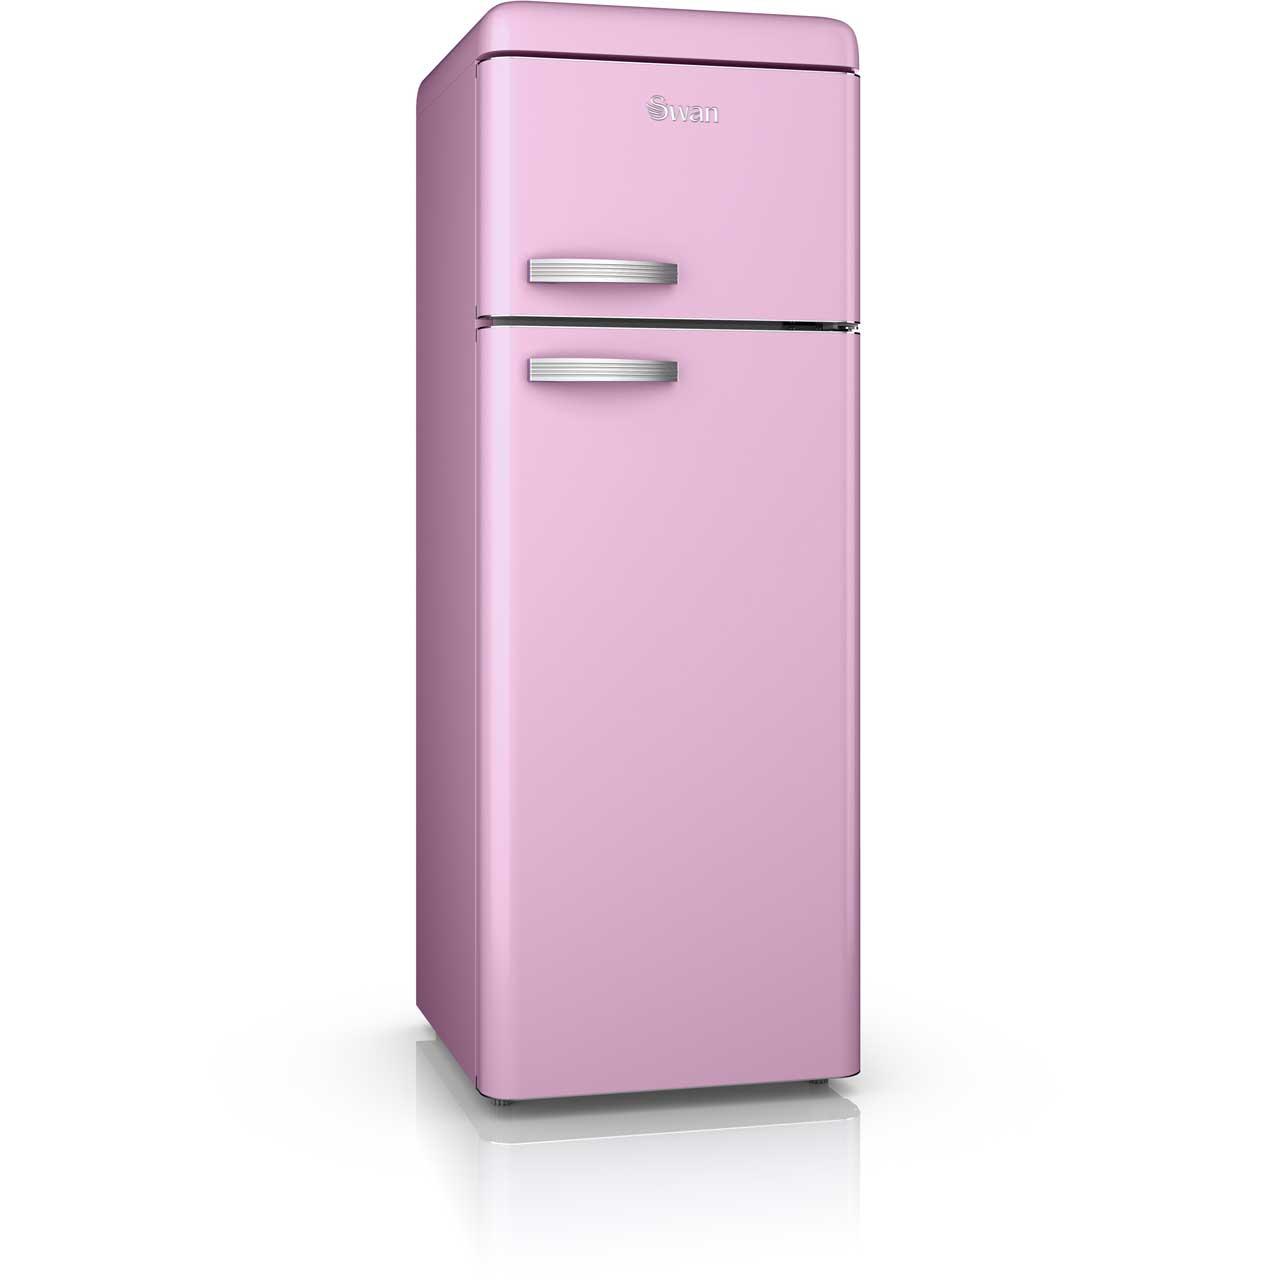 Pink Fridge Freezer Shop For Cheap Fridge Freezers And